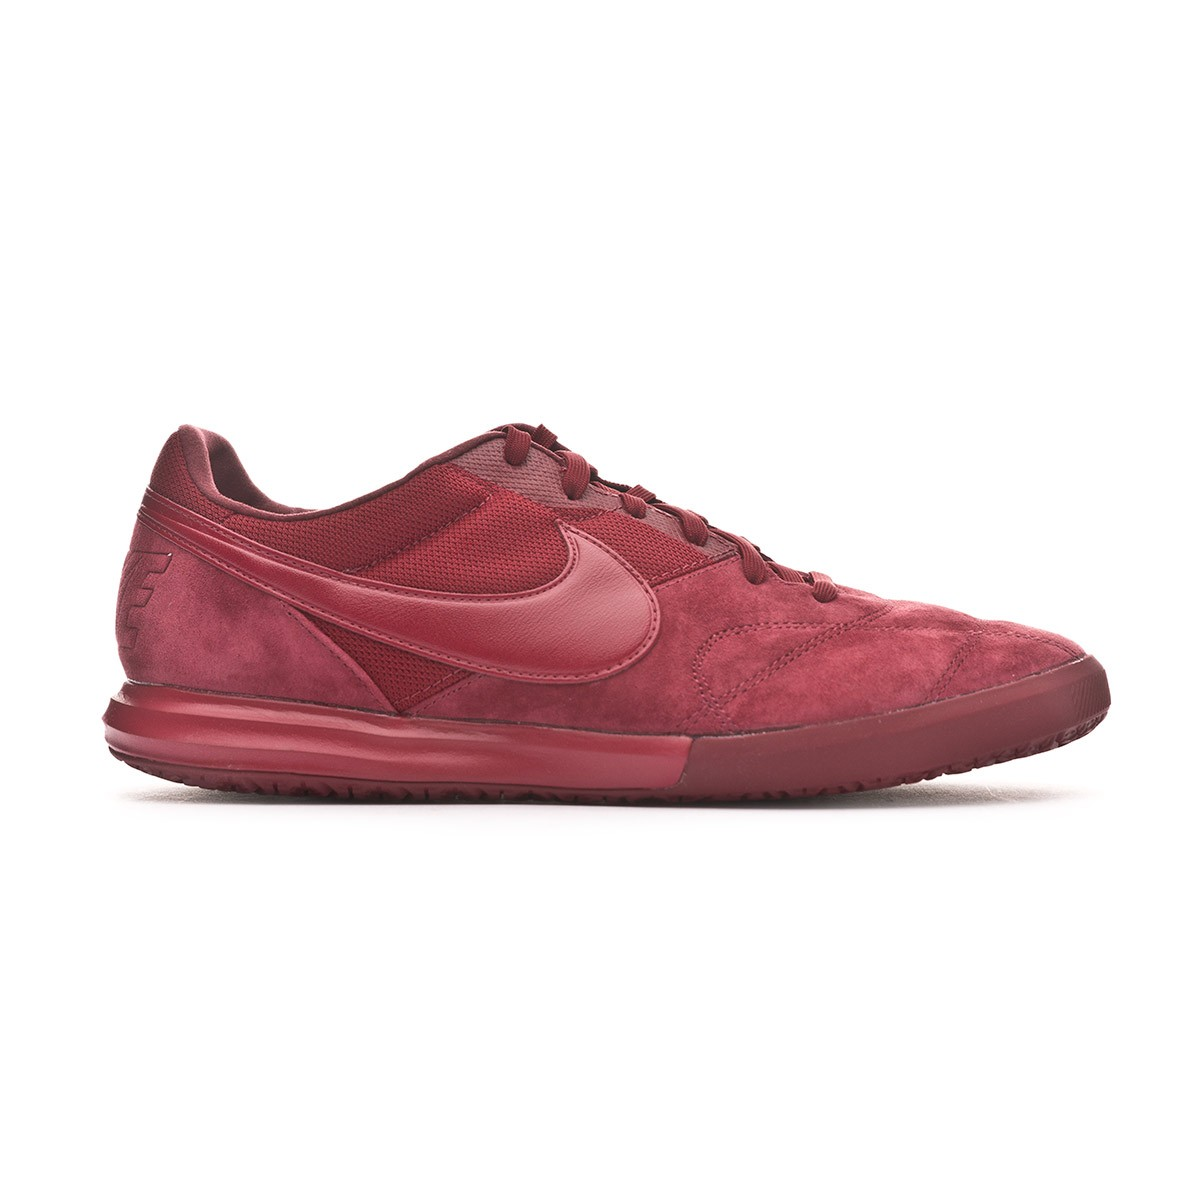 7b7292540 Futsal Boot Nike Tiempo Premier II Sala IC Team red - Football store Fútbol  Emotion